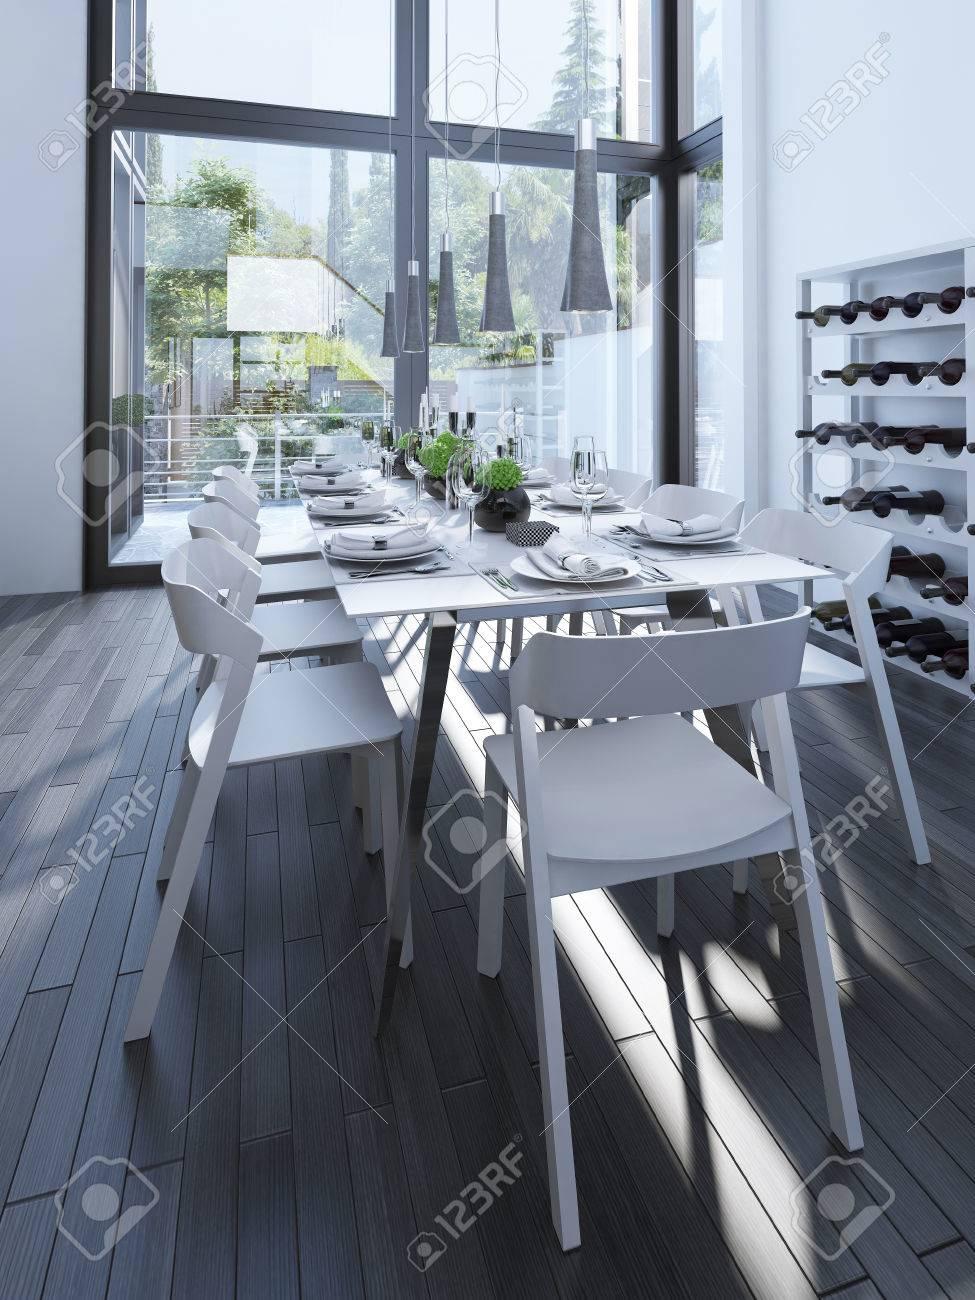 Diseño Moderno Comedor Con Botellero. Vector Servido Con Muebles De ...